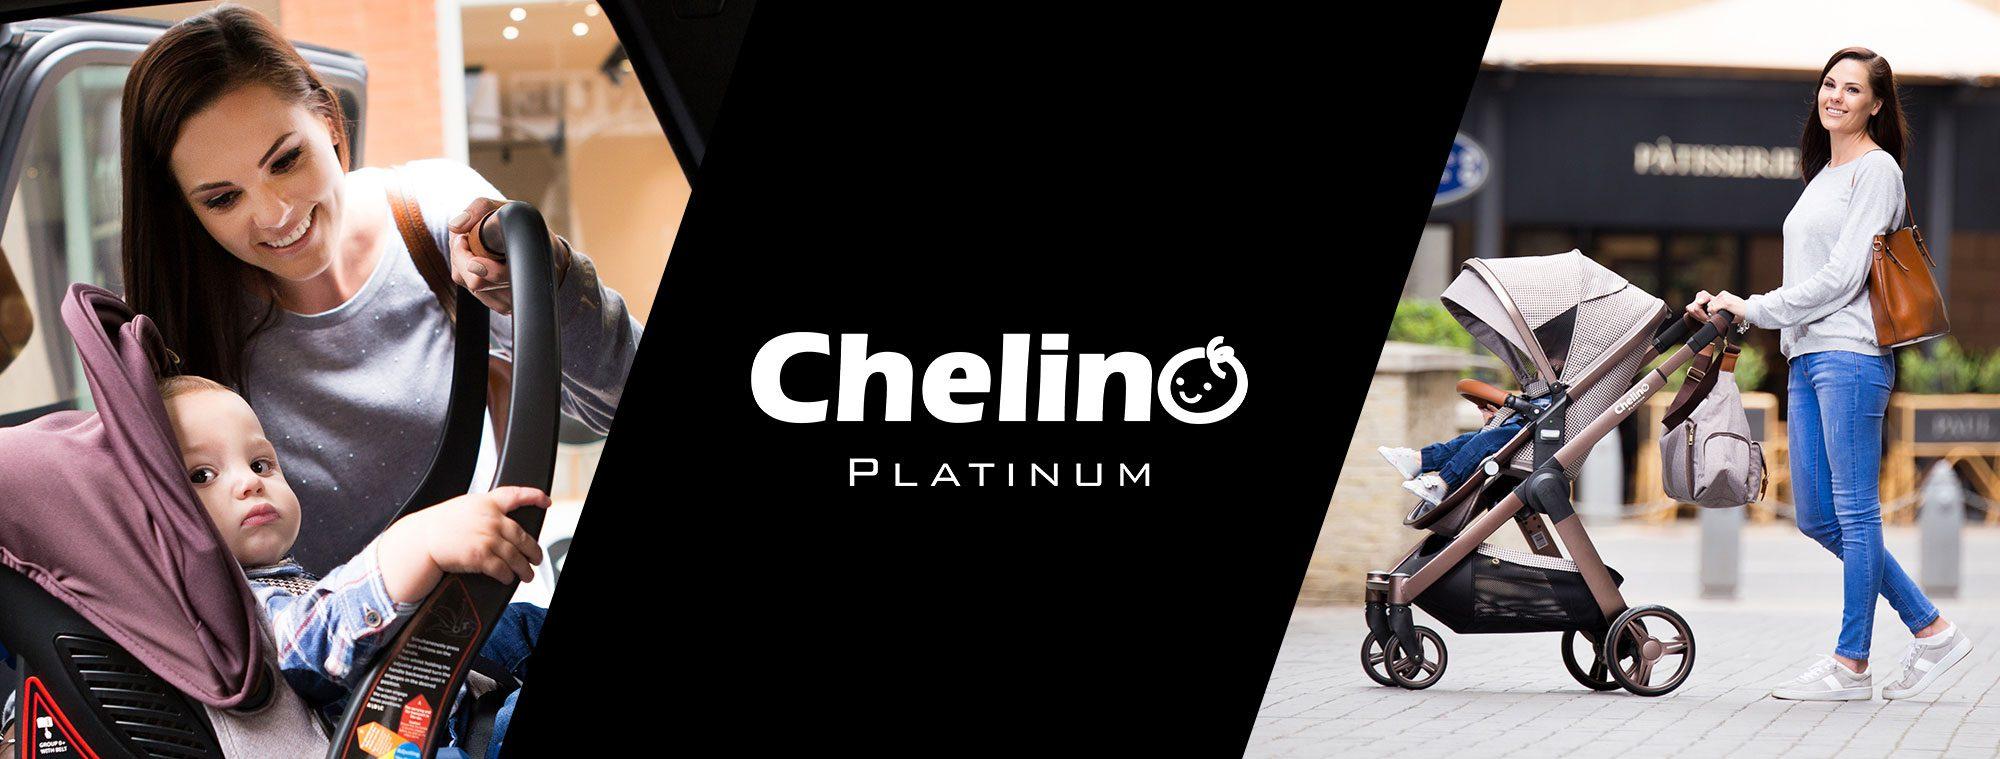 Sliding-Banner-1-chalino-platinum7